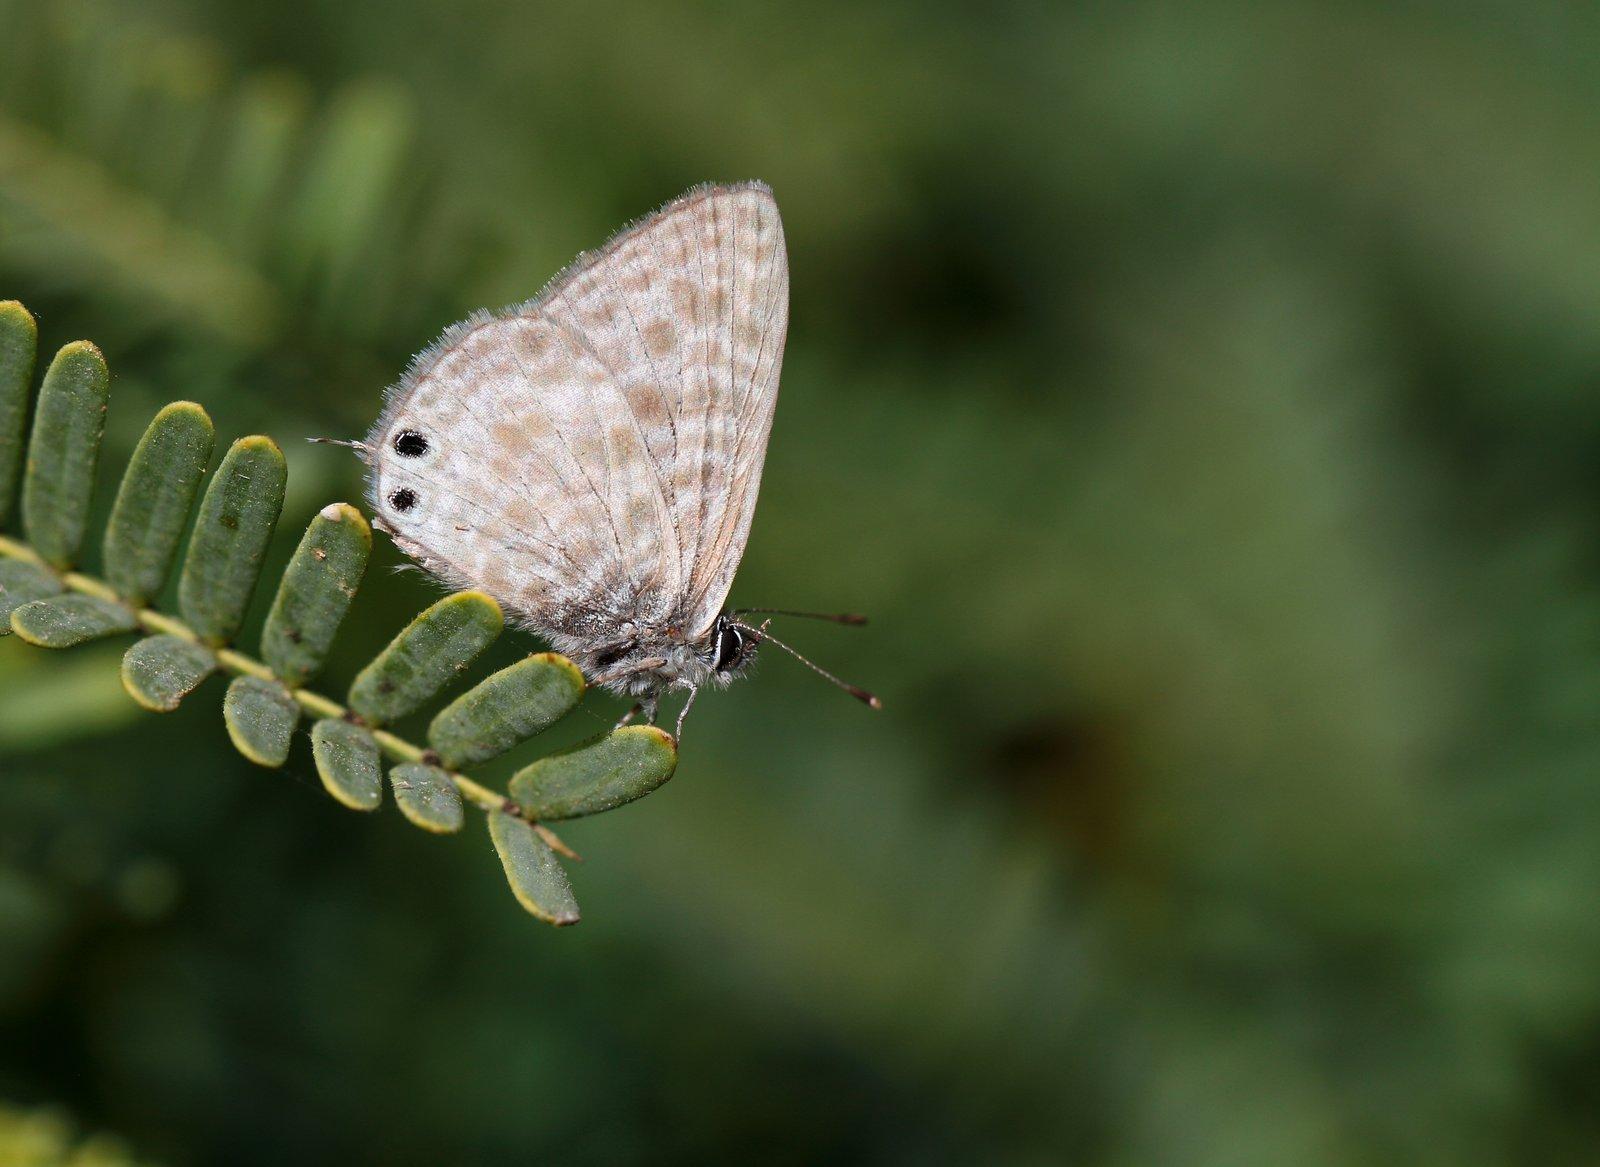 Lille vandreblåfugl, Leptotes pirithous